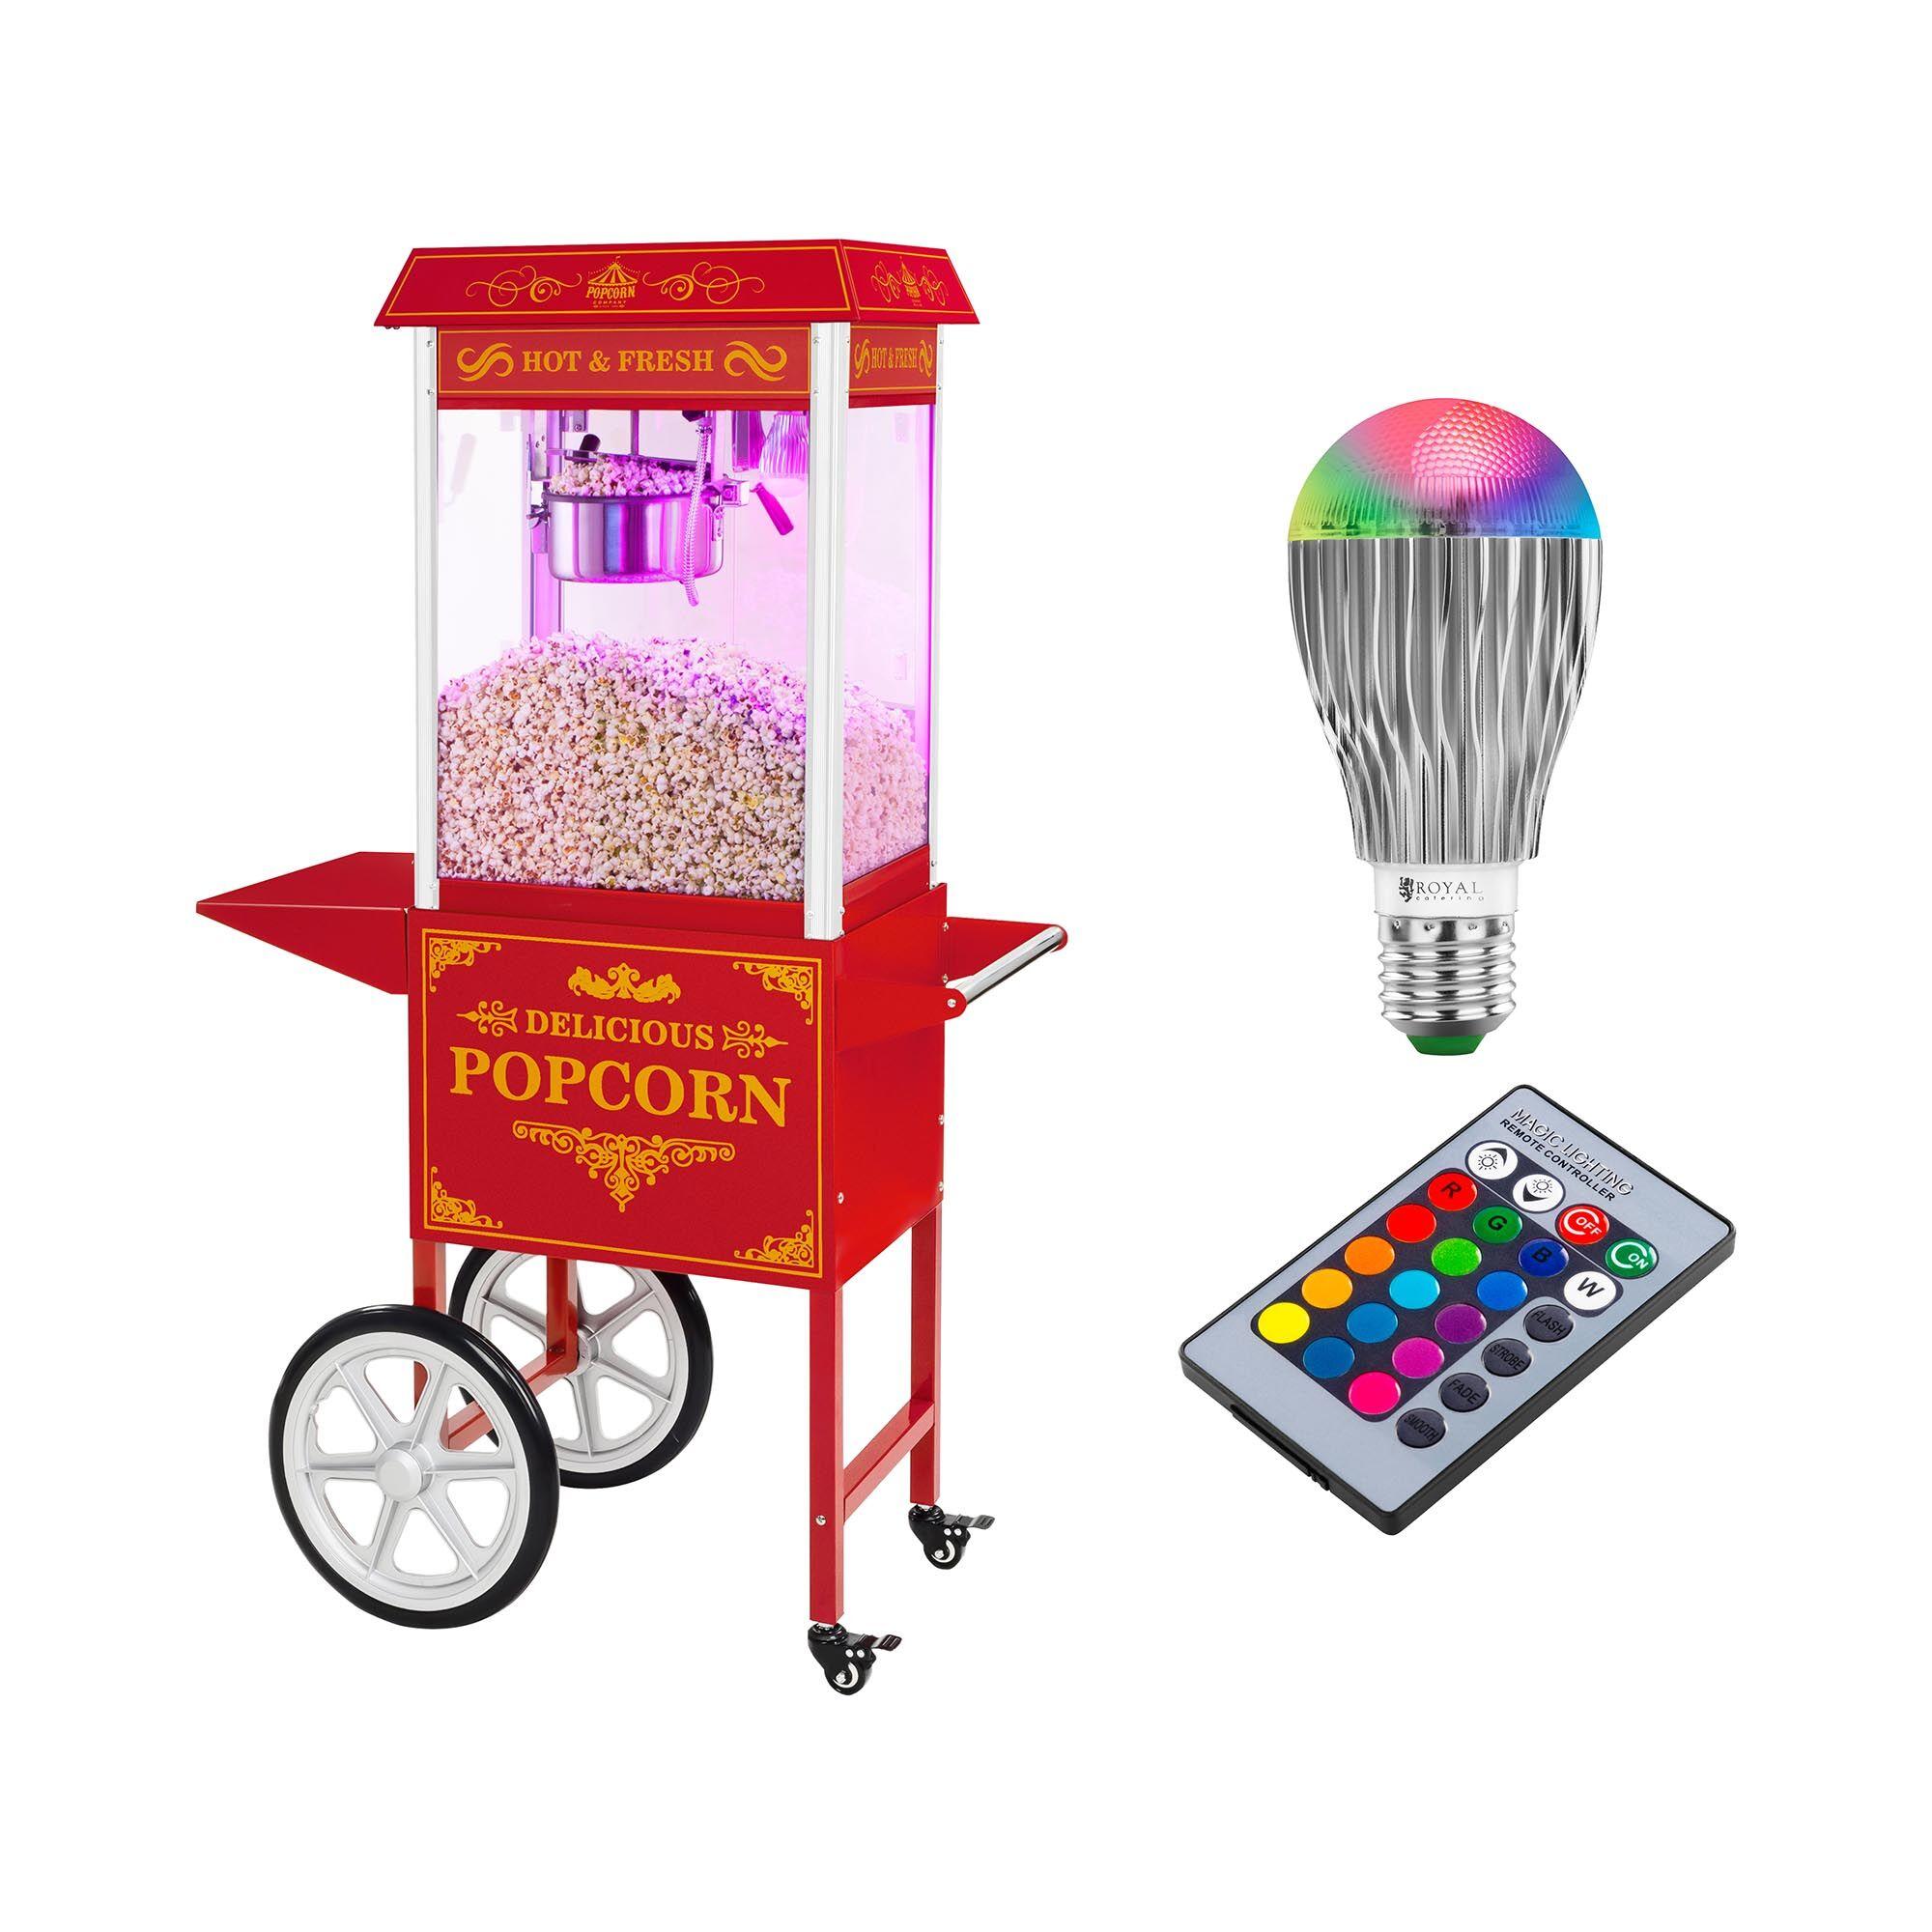 royal catering set macchina per pop corn con carrello e lampadina led - design rétro - rosso rcpw-16.3 popcorn machine led set